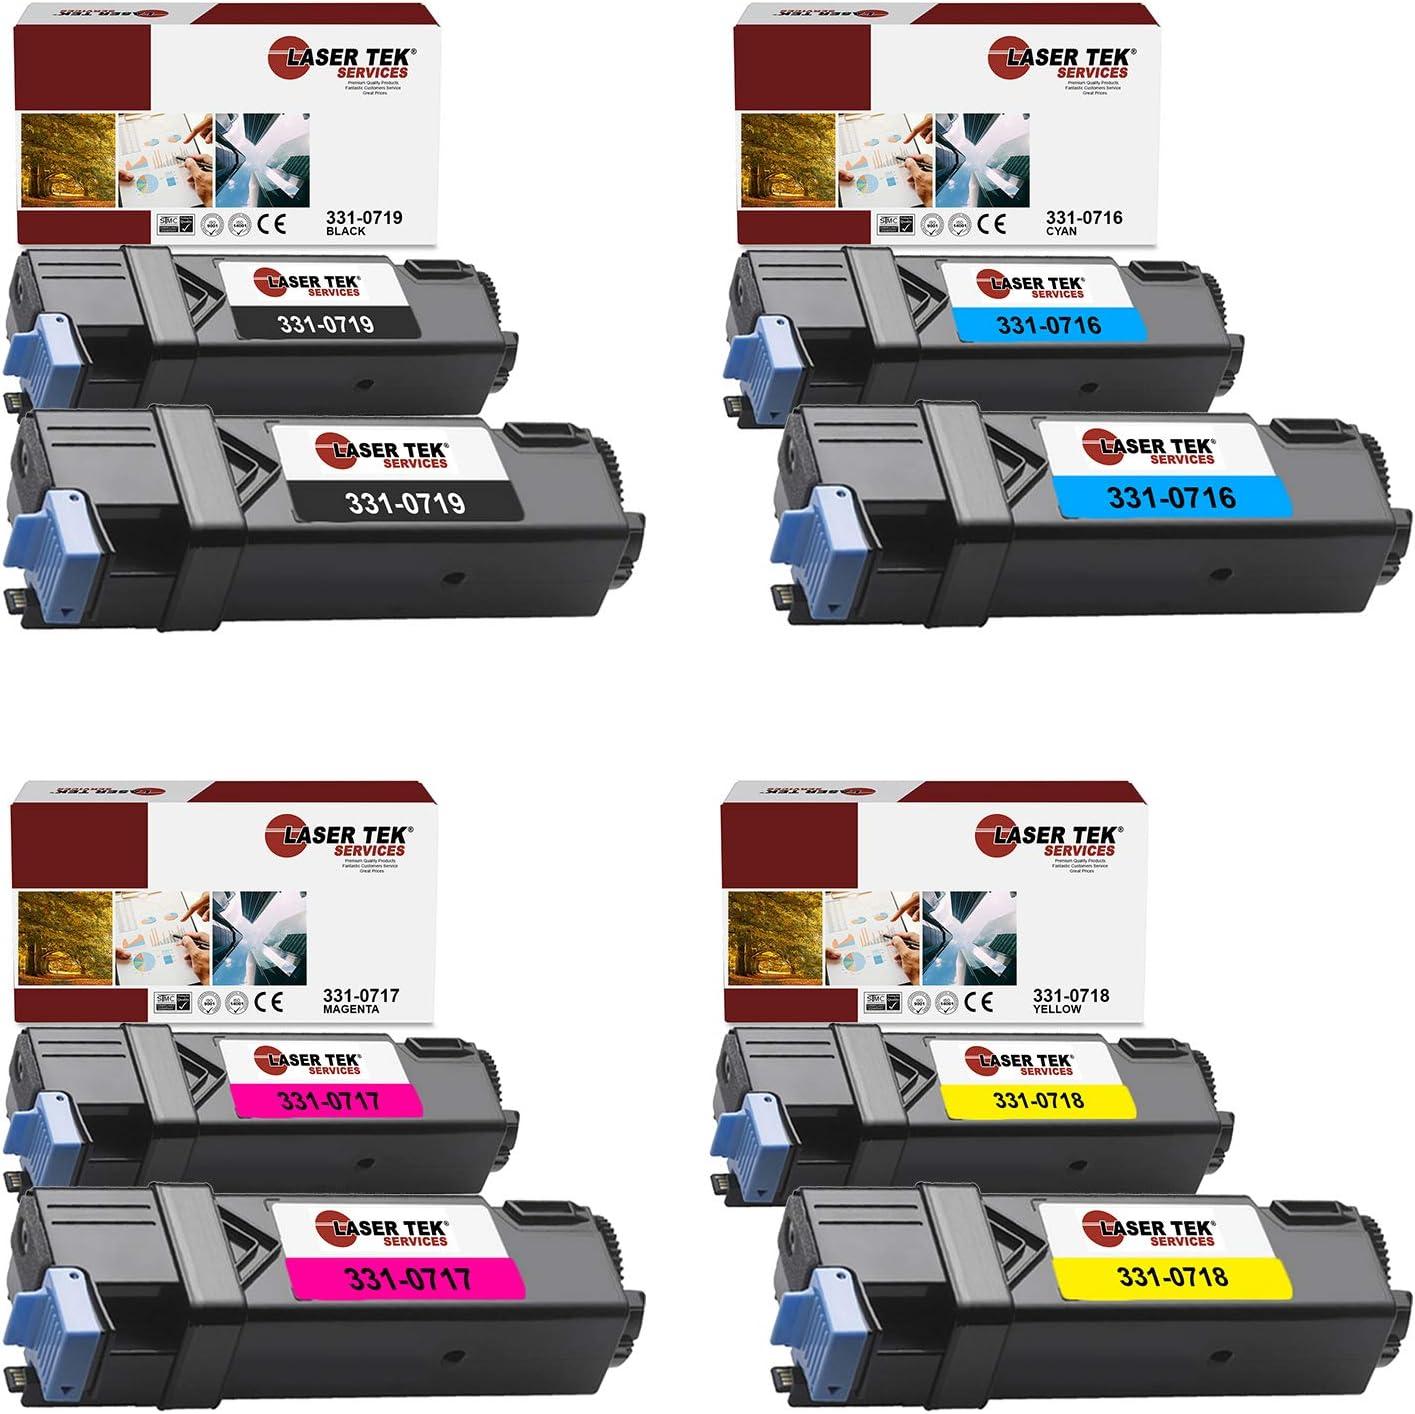 Laser Tek Services Compatible 331-0719 331-0716 331-0717 331-0718 Toner Cartridge Replacement for Dell 2150 2150CDN 2150CN 2155 2155CDN 2155CN Printers (Black, Cyan, Magenta, Yellow, 8 Pack)